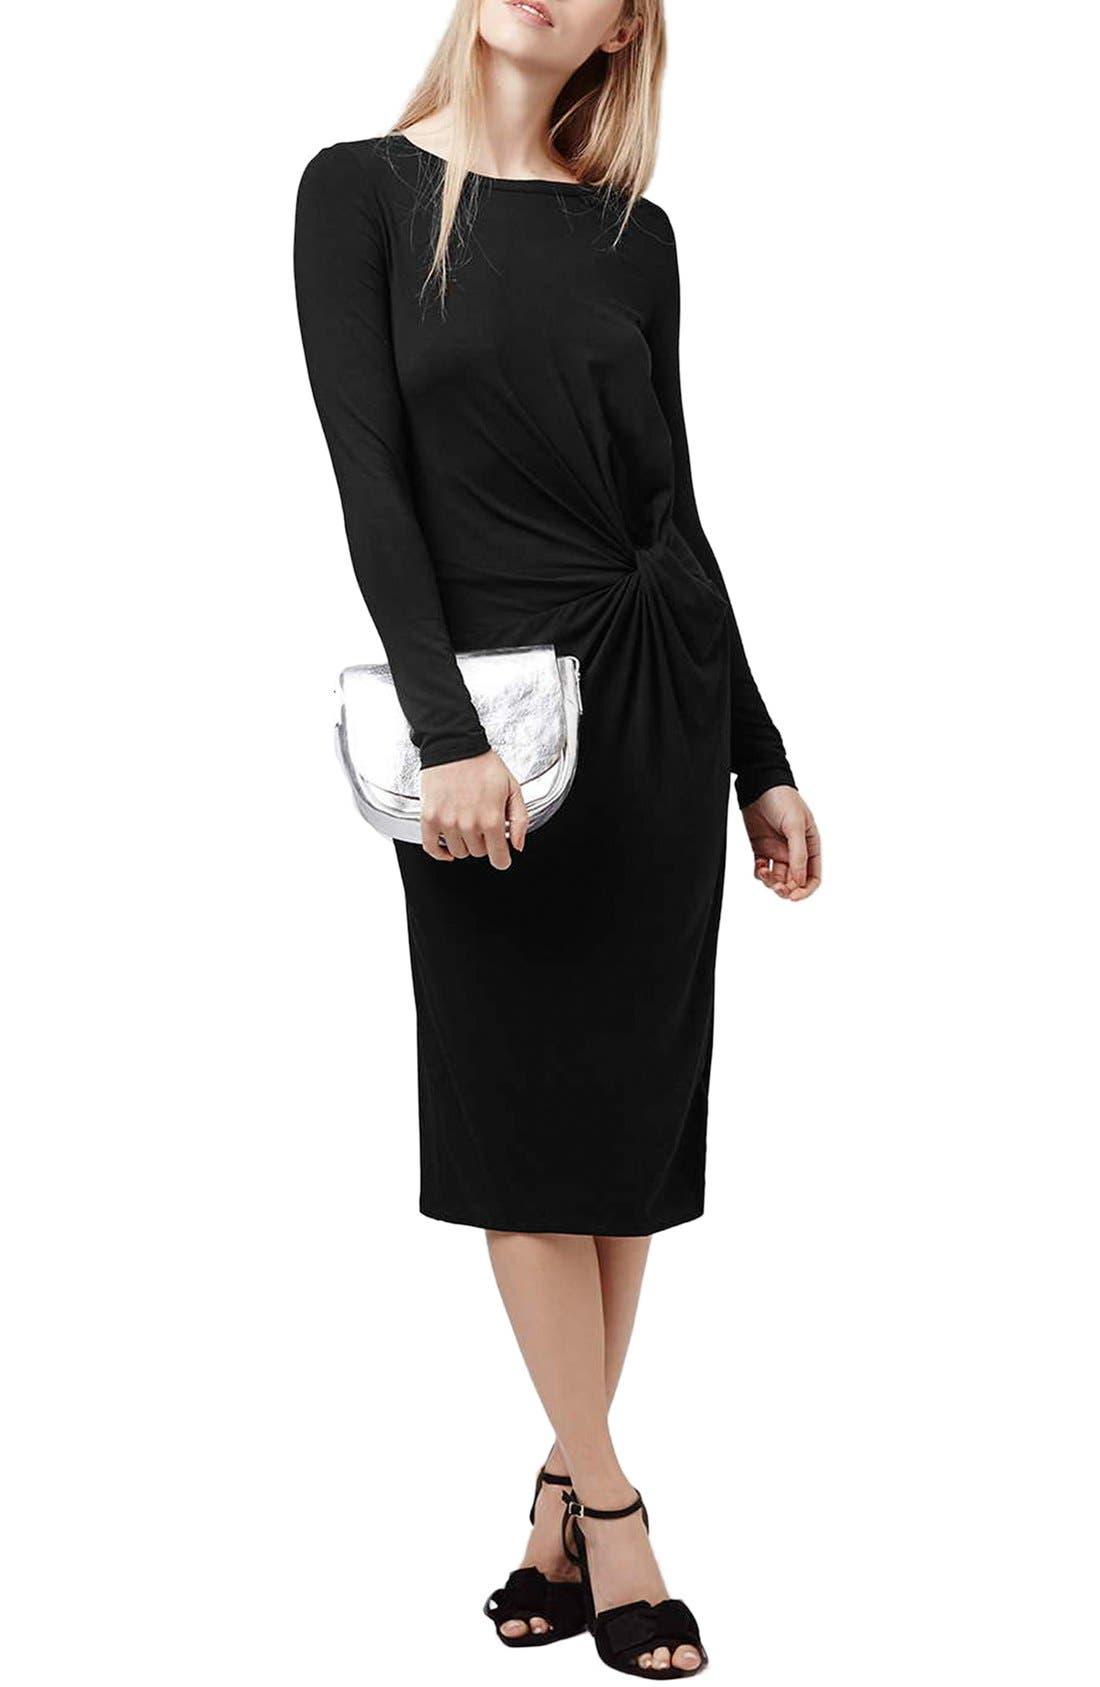 Alternate Image 1 Selected - Topshop Knot Front Dress (Regular & Petite)